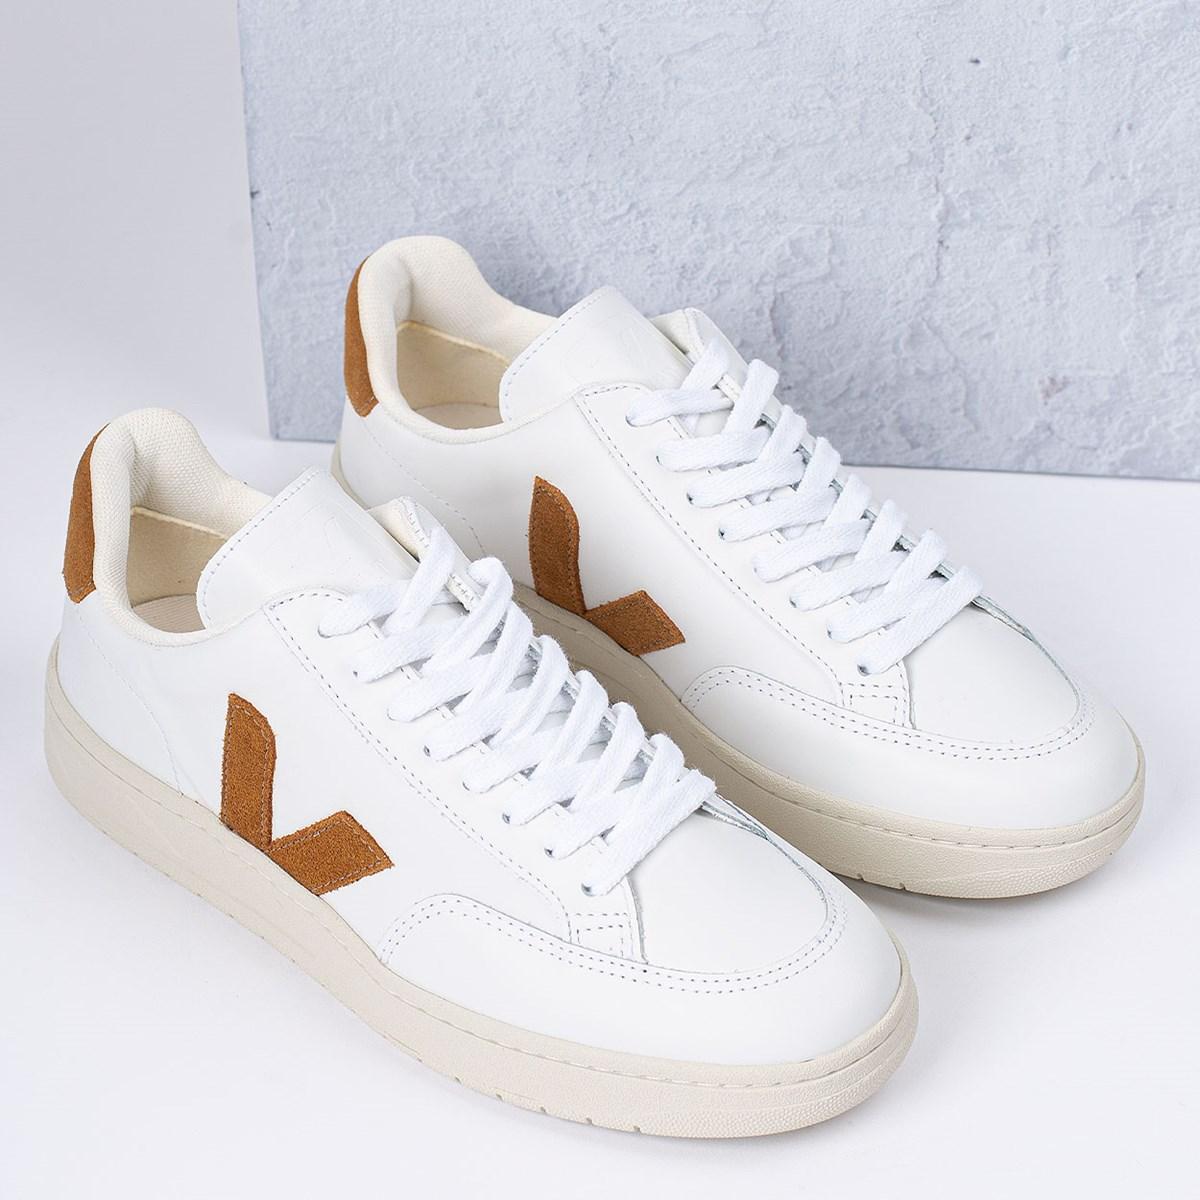 Tênis Vert Shoes V-12 Leather Extra White Camel XD022322